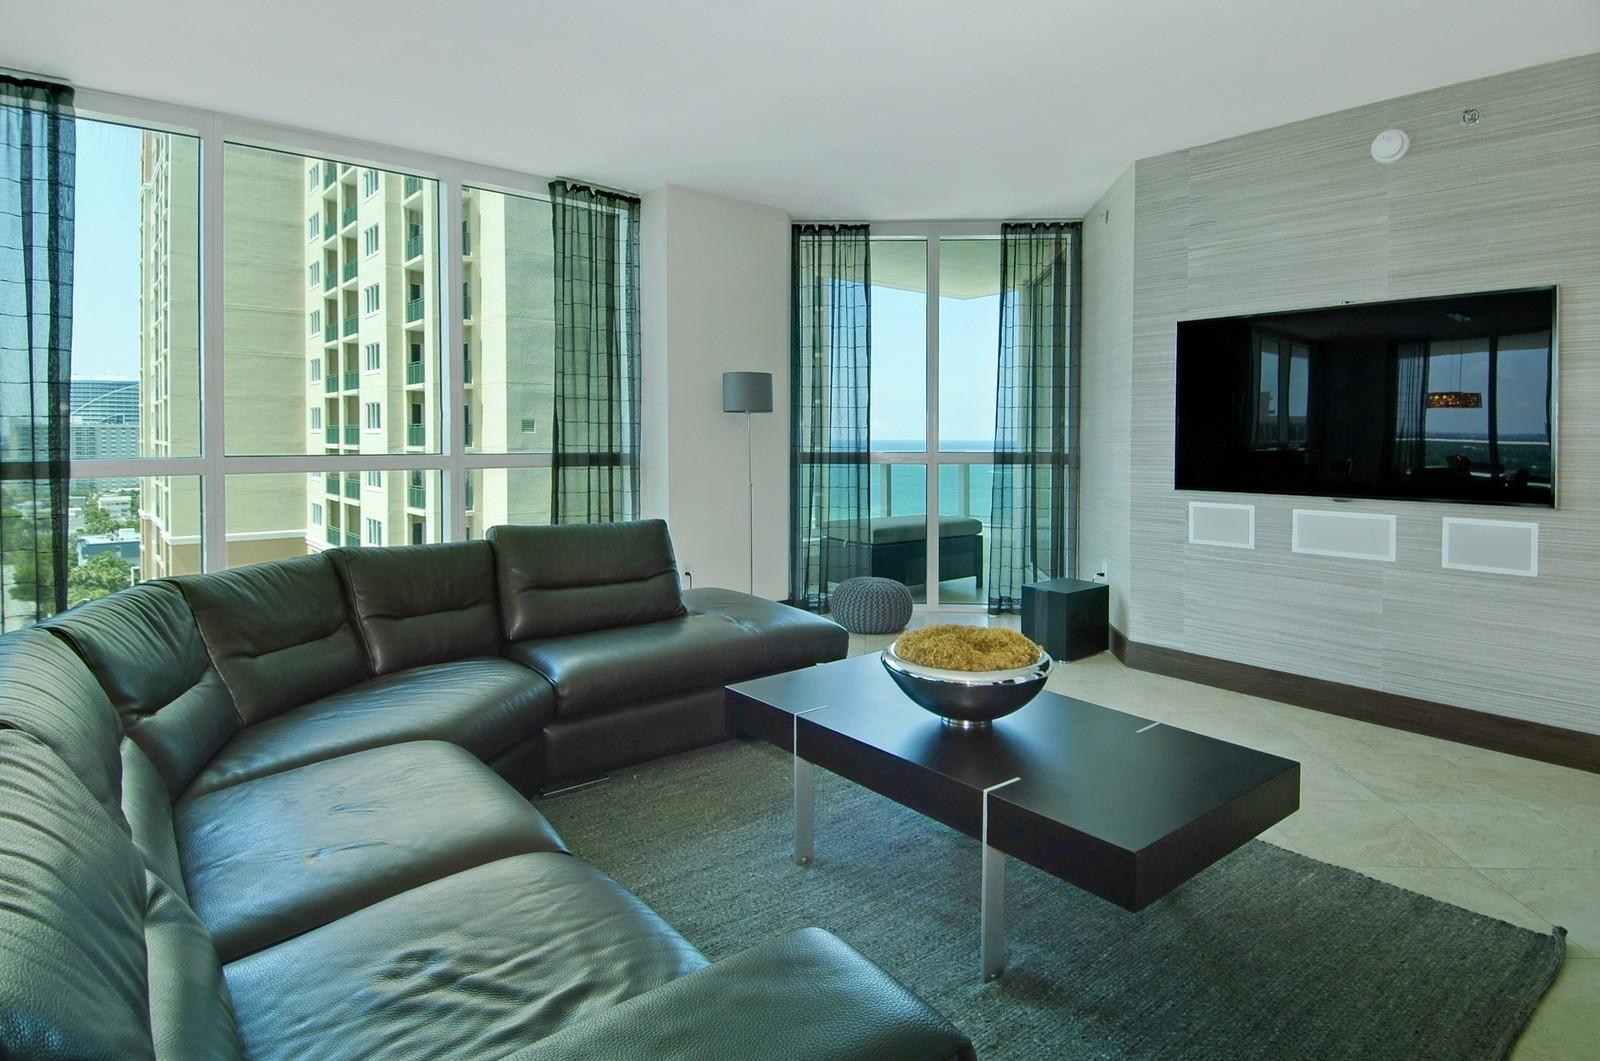 Real Estate Photography - 101 S Fort Lauderdale Beach Blvd, Unit 1506, Fort Lauderdale, FL, 33316 - Living Room